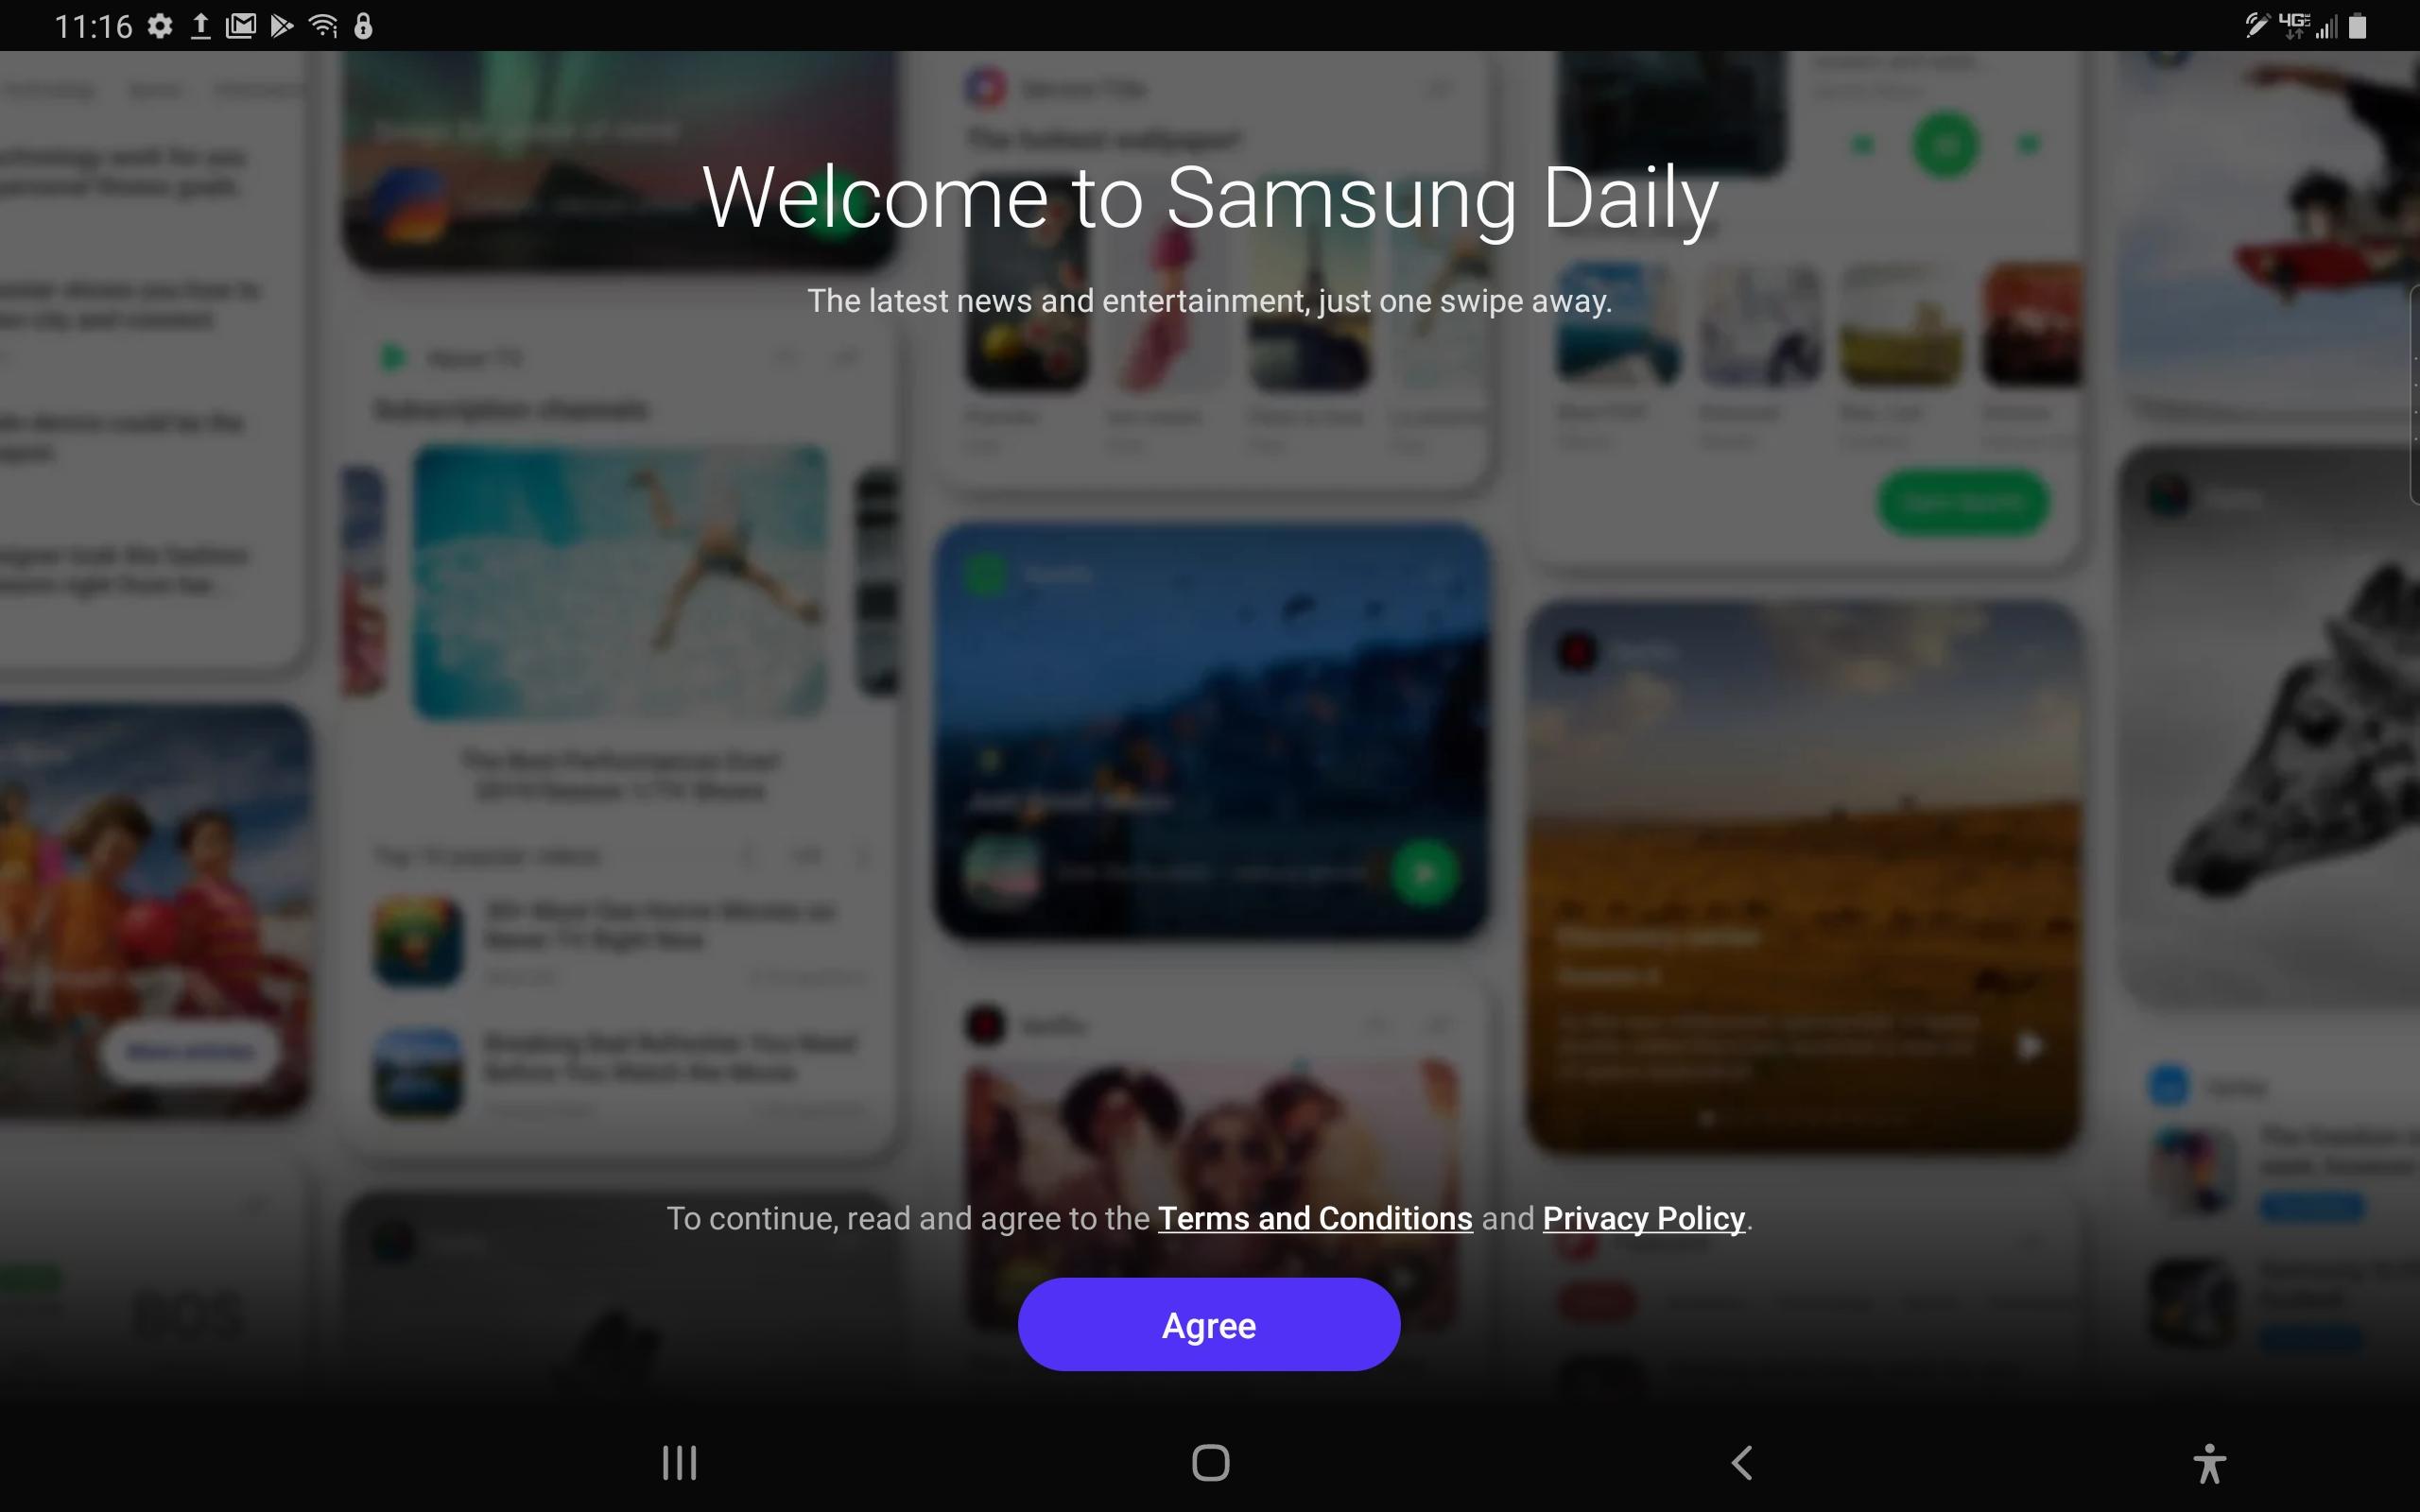 Samsung Galaxy Tab A 8-inch Samsung Daily screenshot